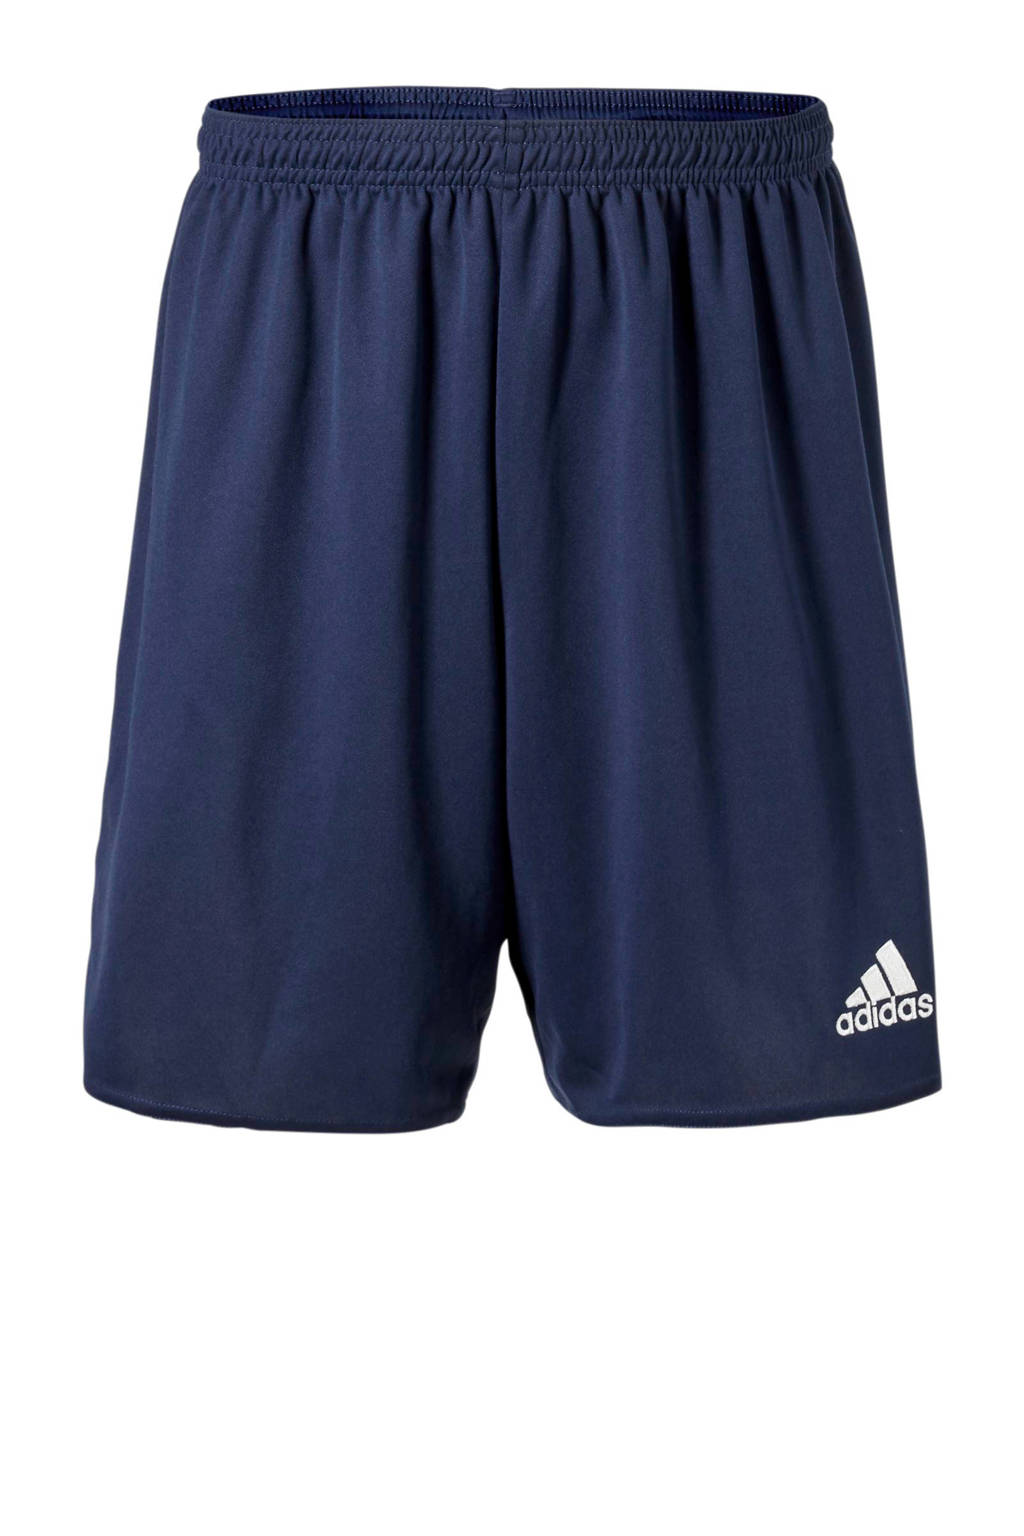 adidas   sportshort Parma donkerblauw, Donkerblauw